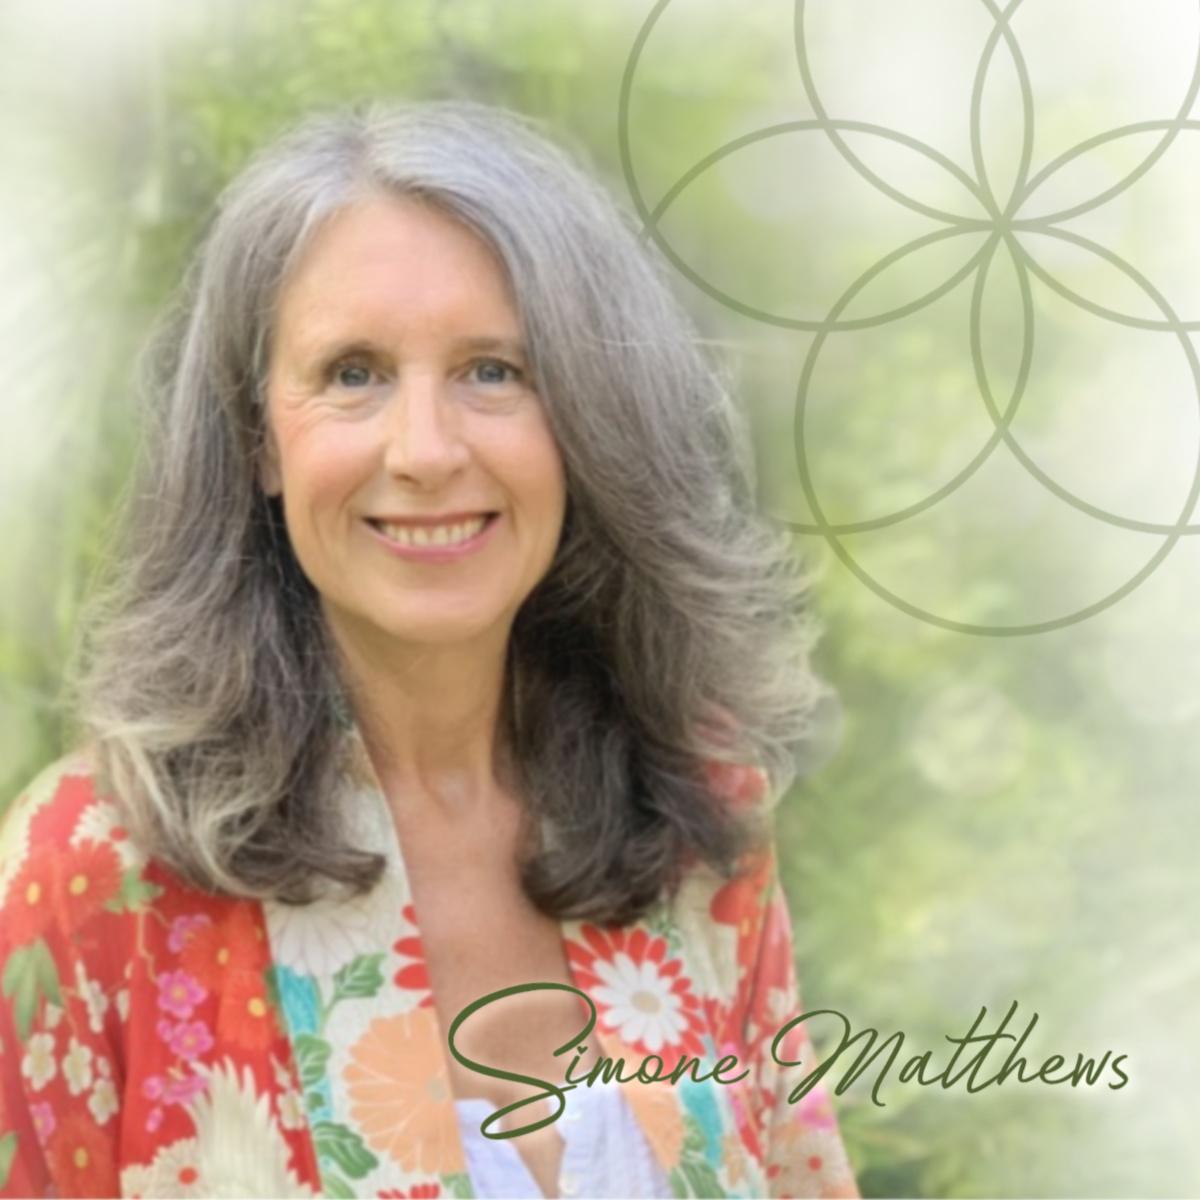 Simone M Matthews Heart Wisdom nw 3 nc